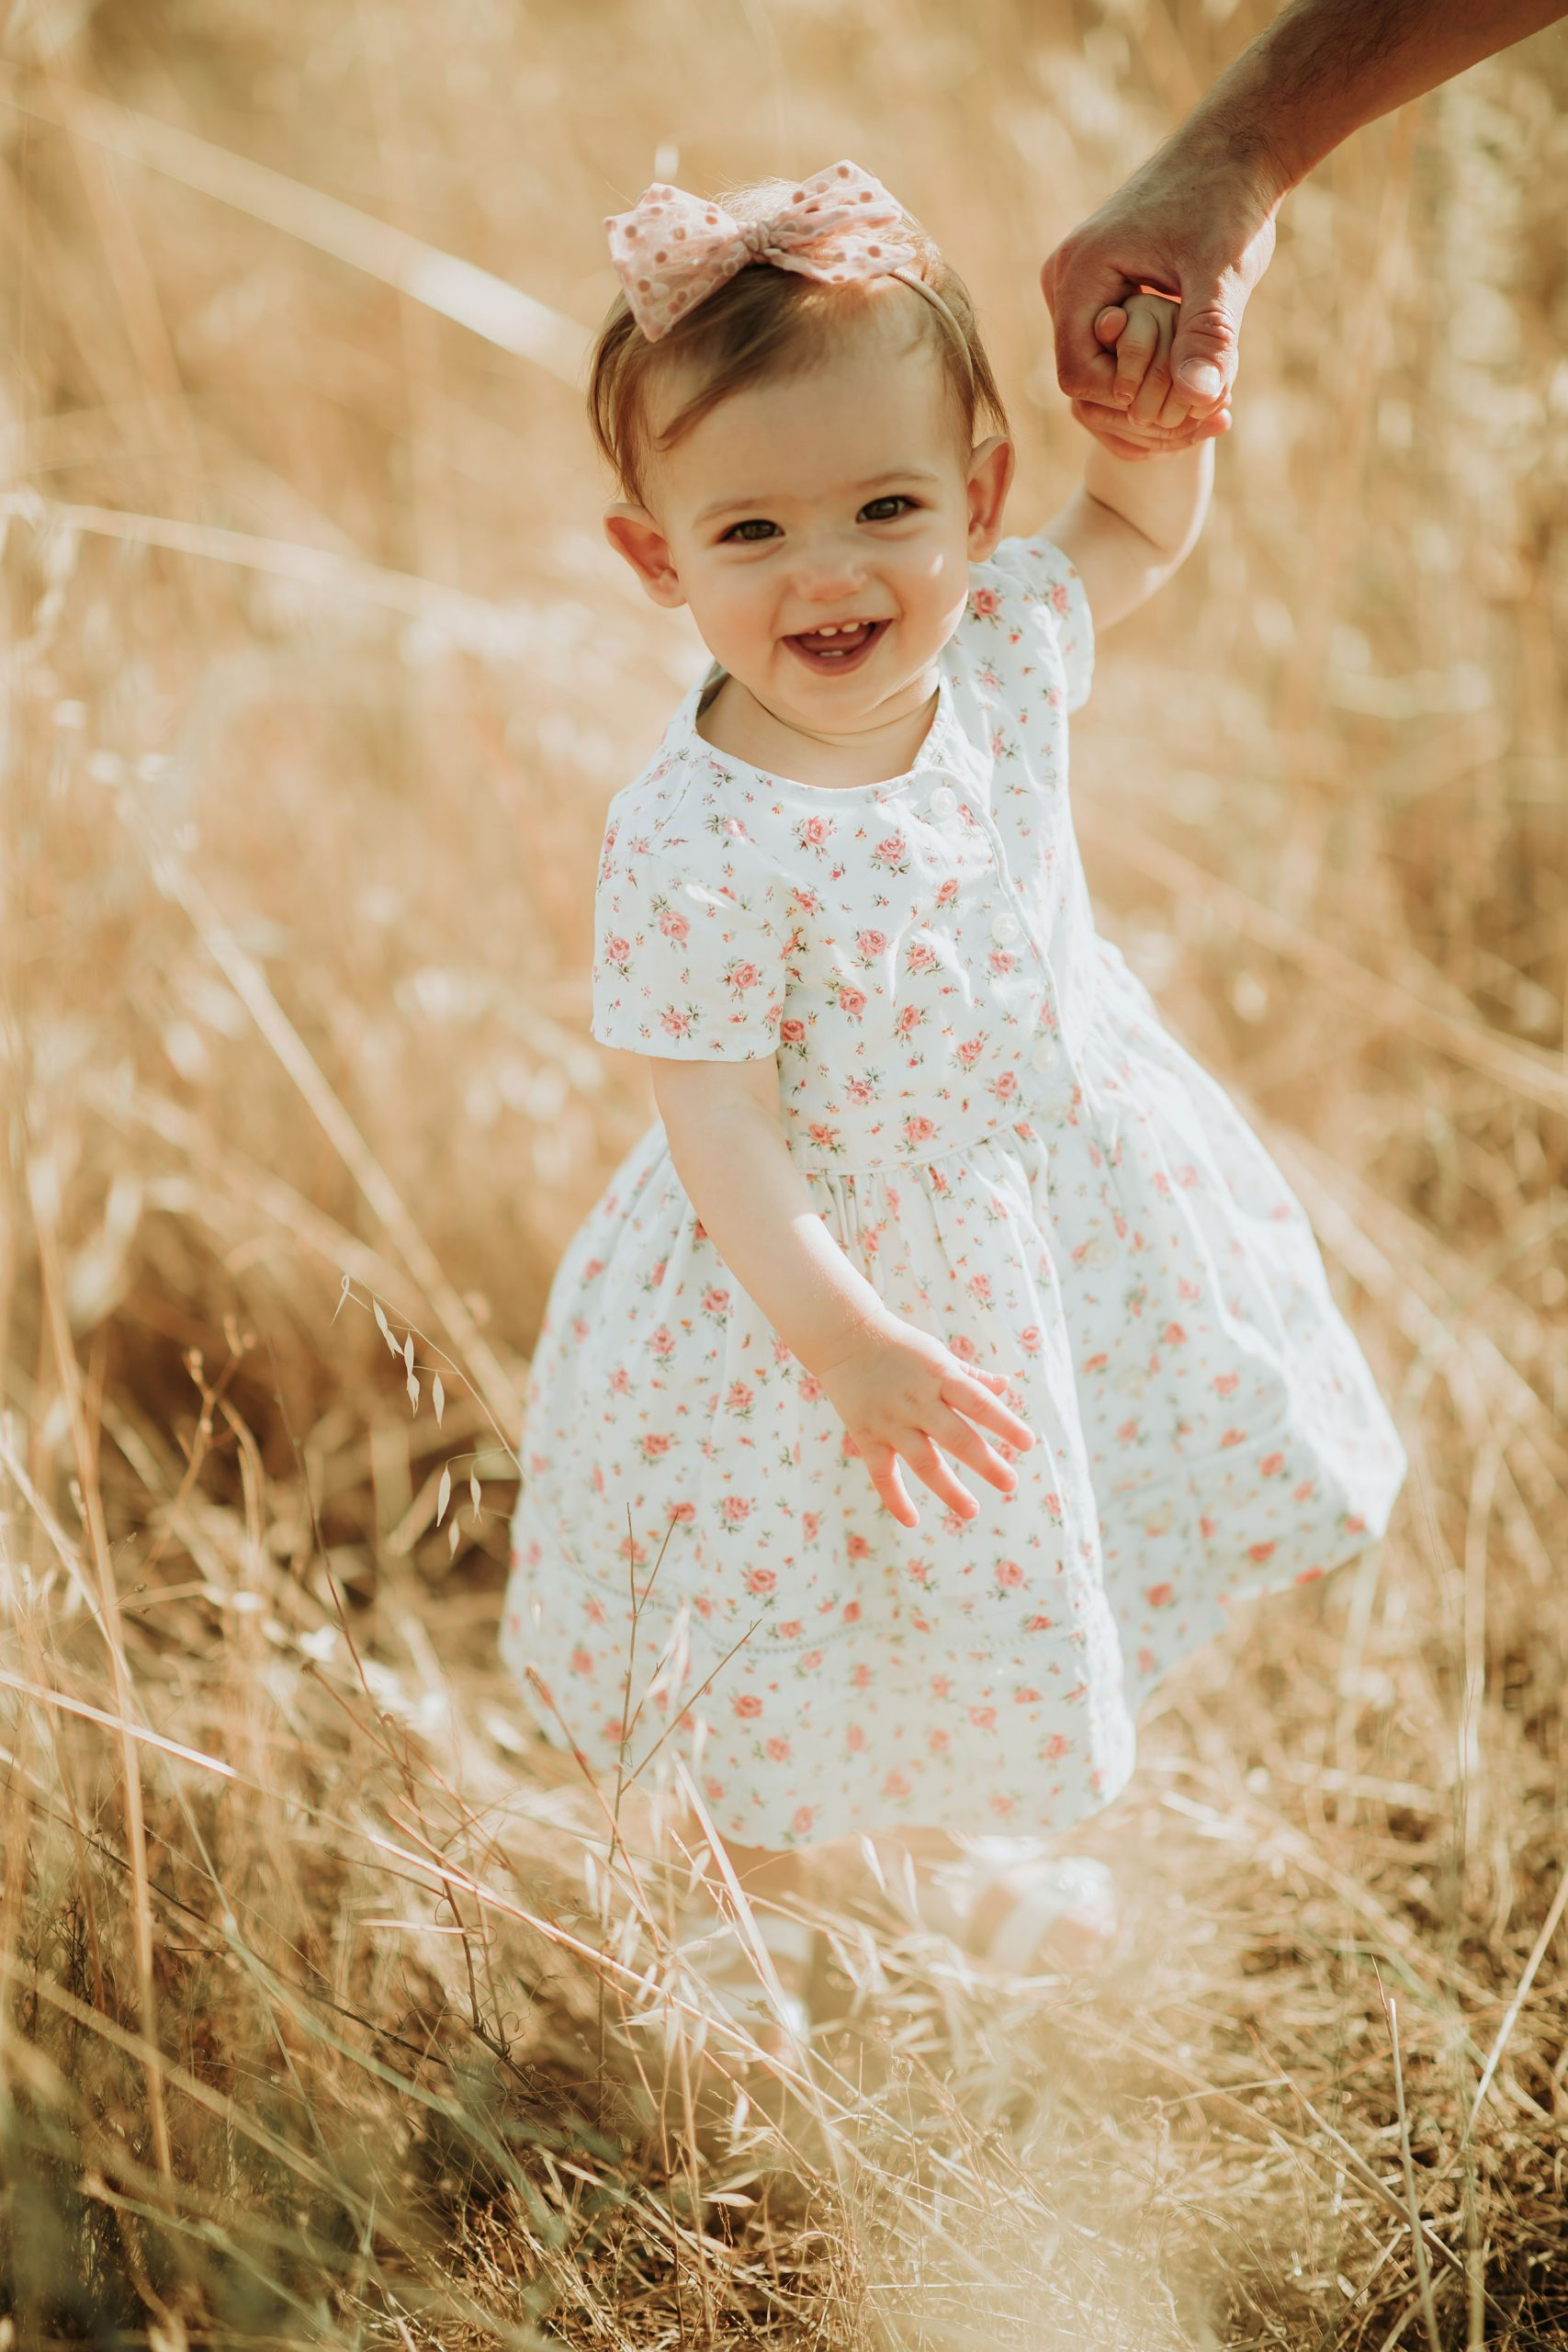 Beautiful baby smiling at the camera